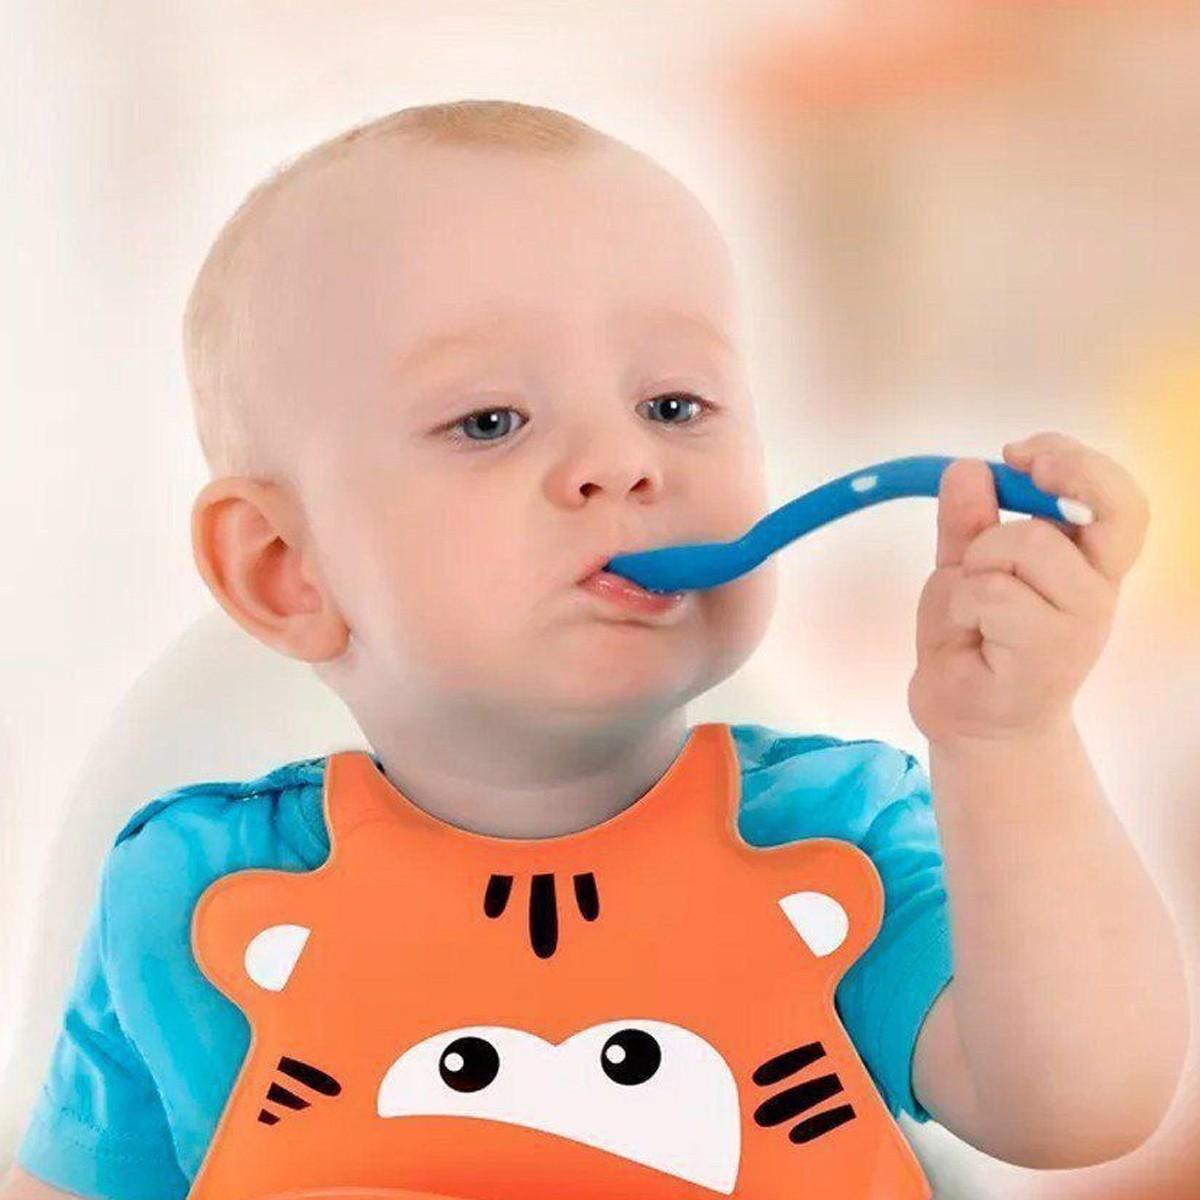 Babador De Silicone Para Bebê Impermeavel Leão Multilaser